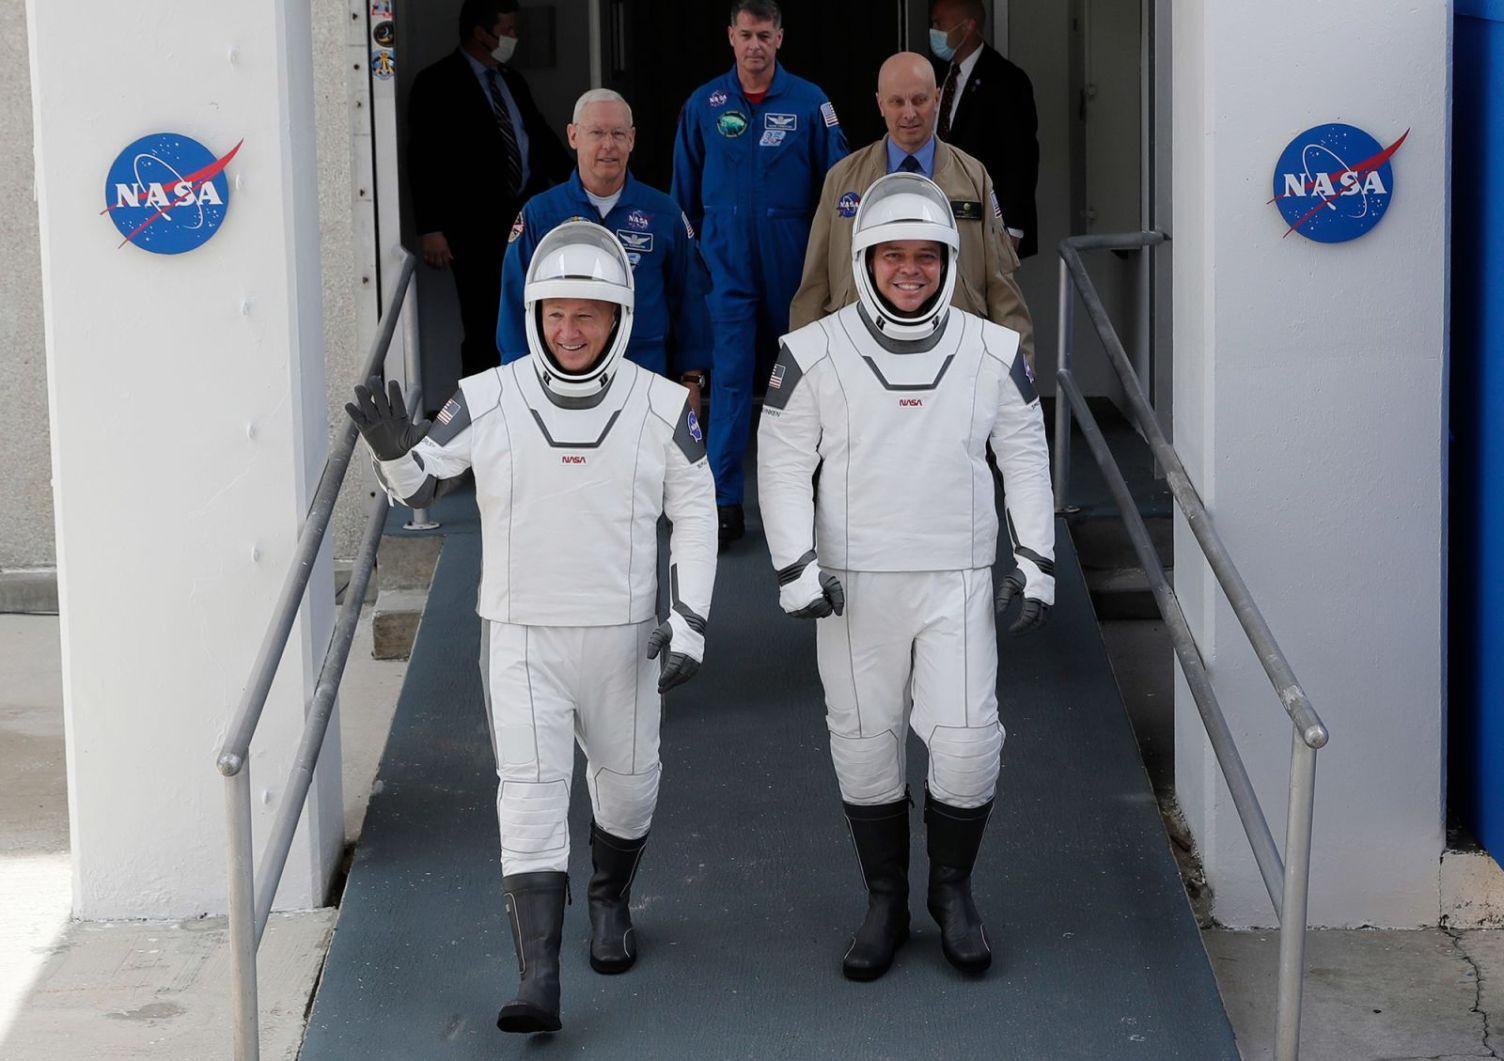 Doug Hurley e Bob Behnken escono dal Neil Armstrong Operations and Checkout Building presso il Kennedy Space Center